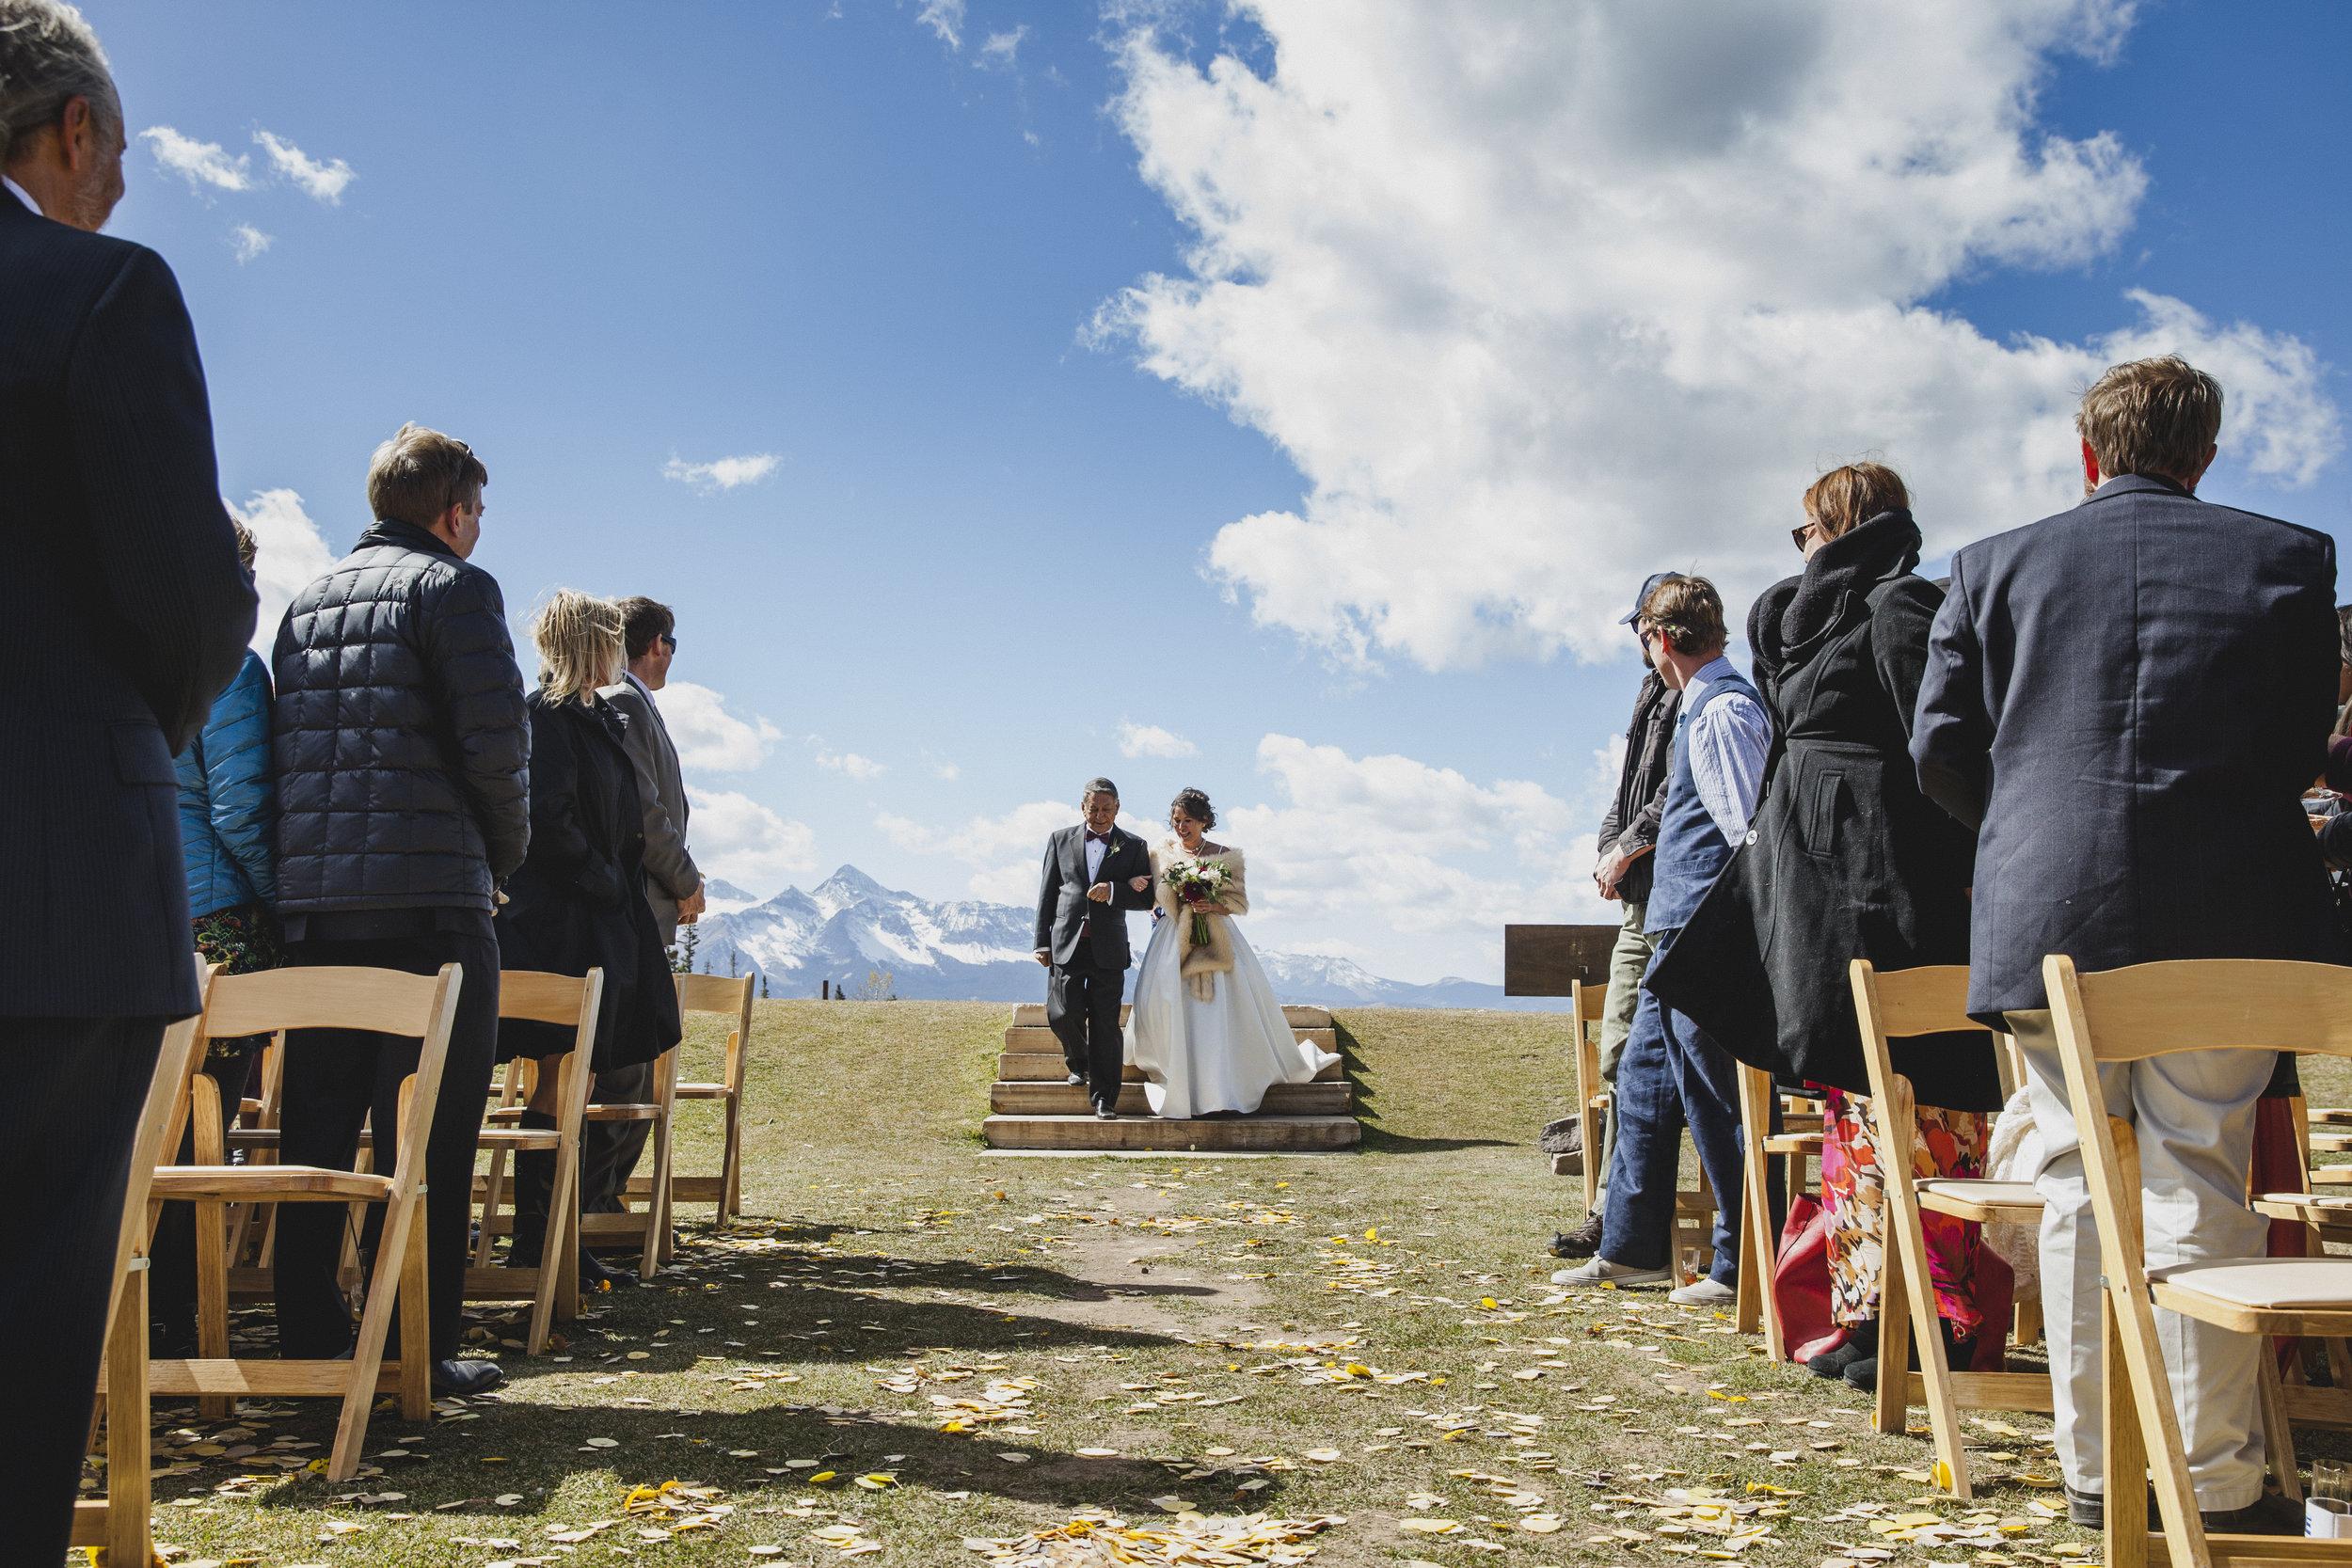 NE-LeahandAshtonphotography-Telluride-Wedding-Photography-6796.jpg